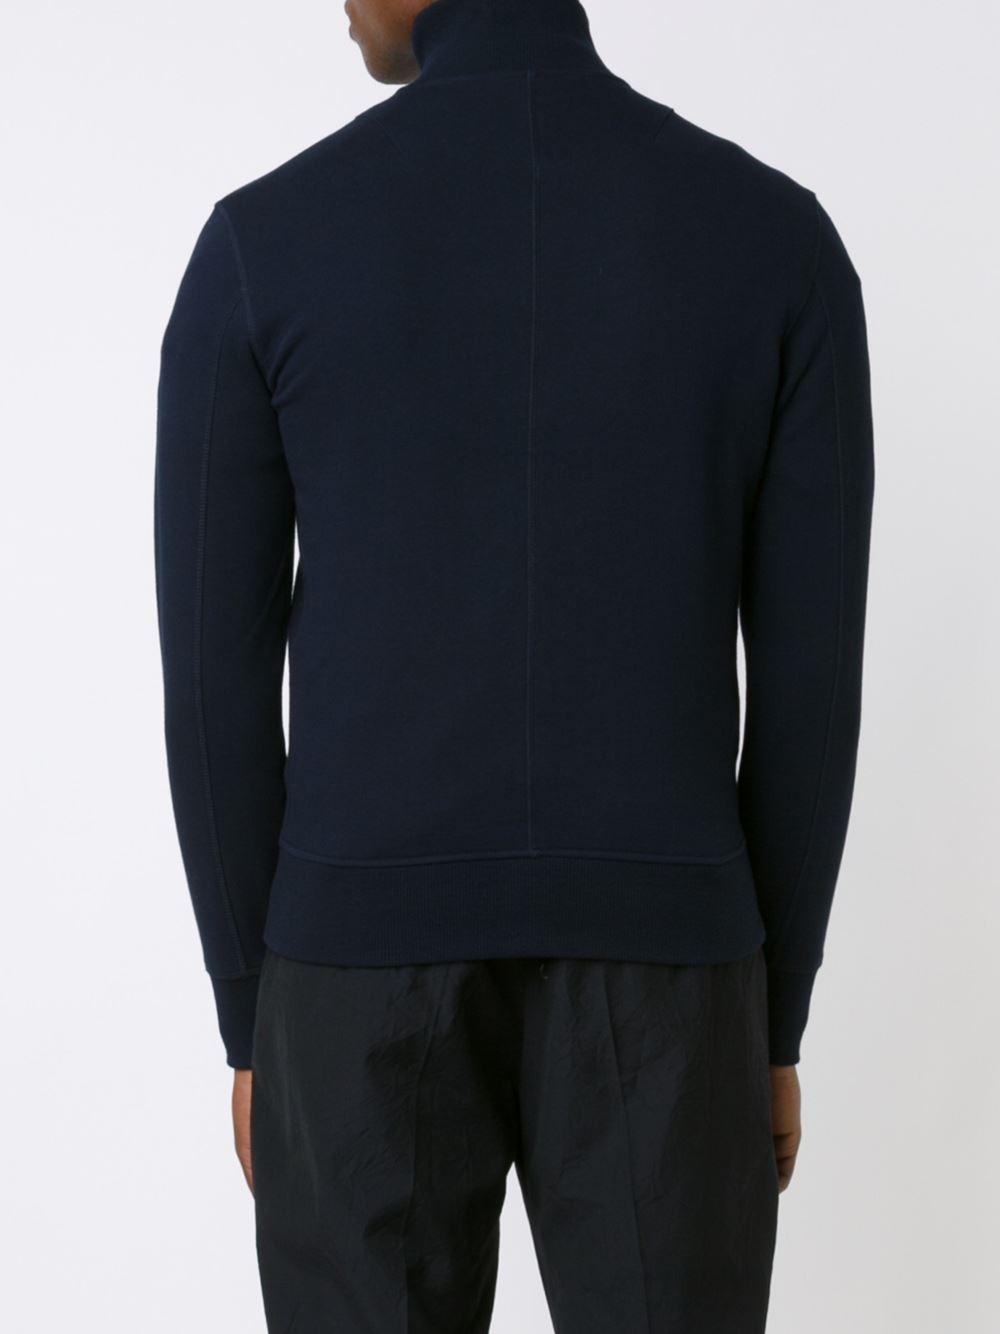 Rag & Bone Cotton Zipped Jacket for Men